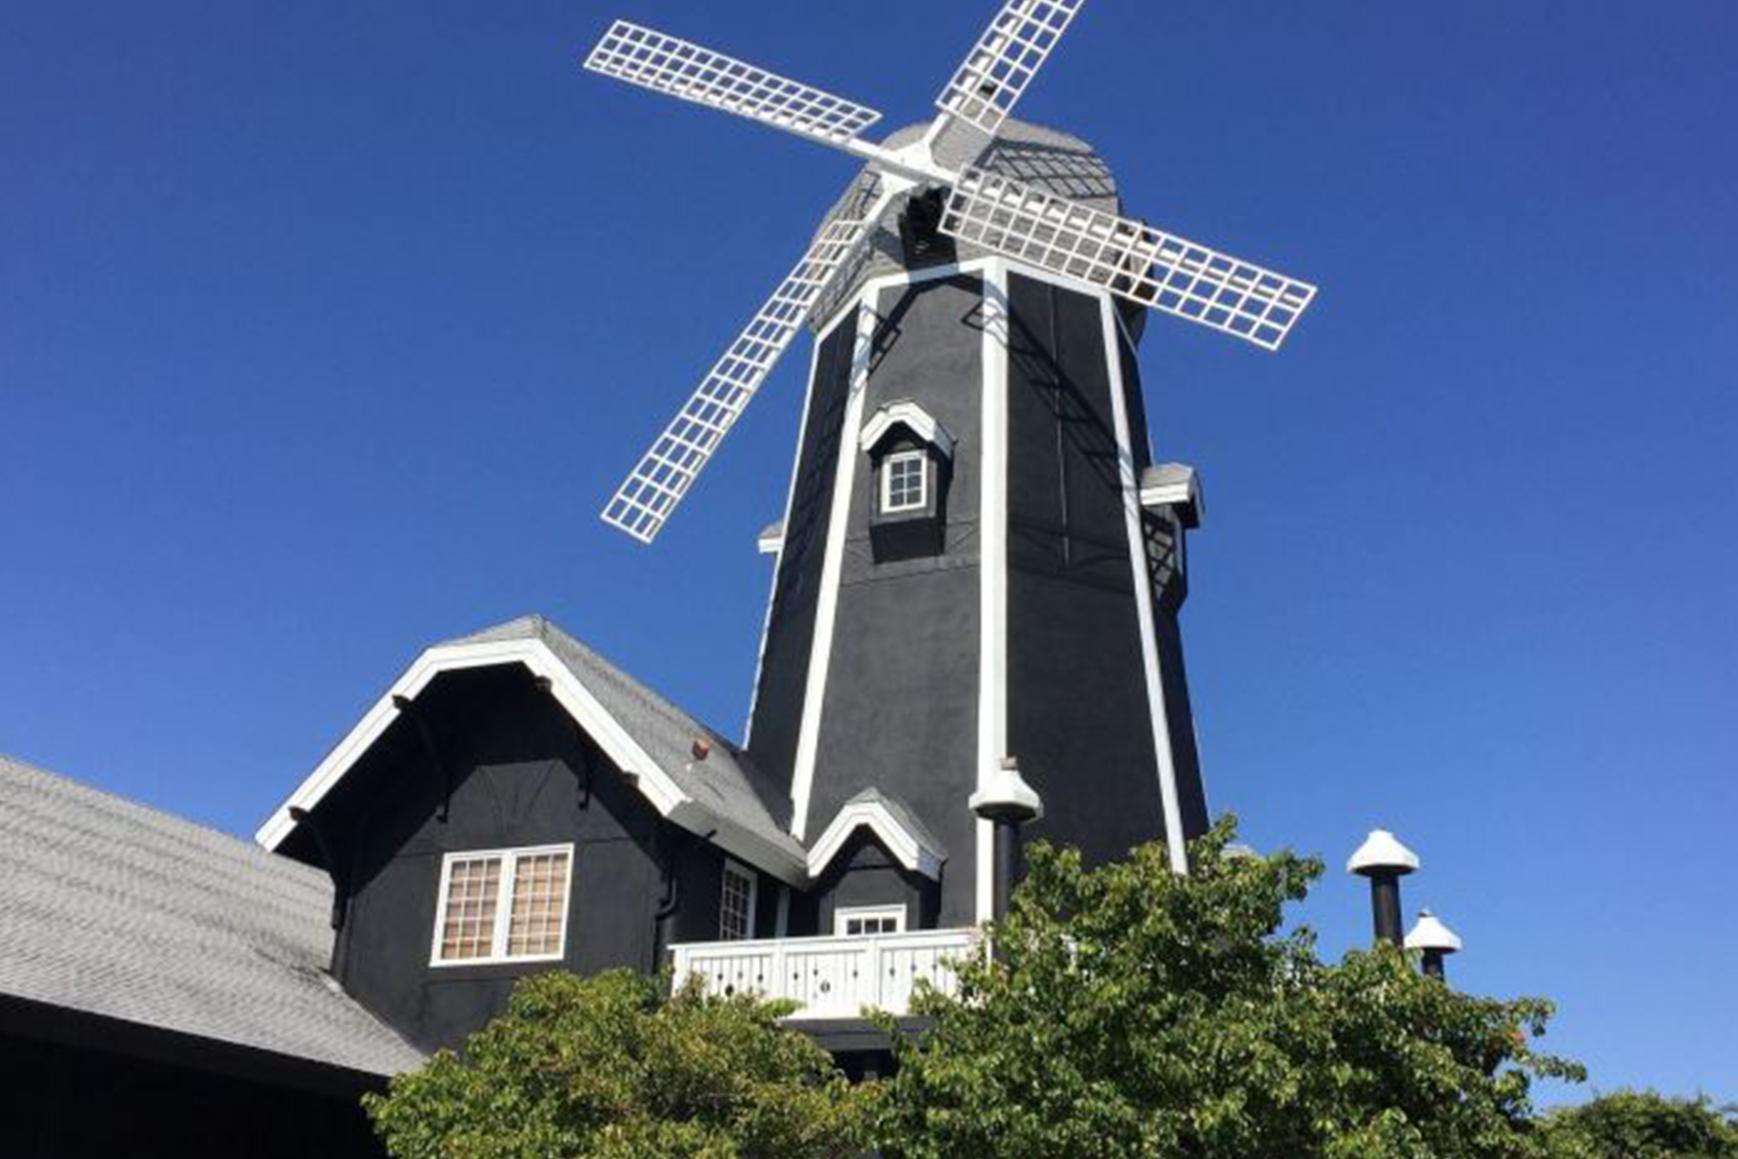 The Windmill - Carlsbad Windmill - Carlsbad, California - San Diego County - Wedgewood Weddings